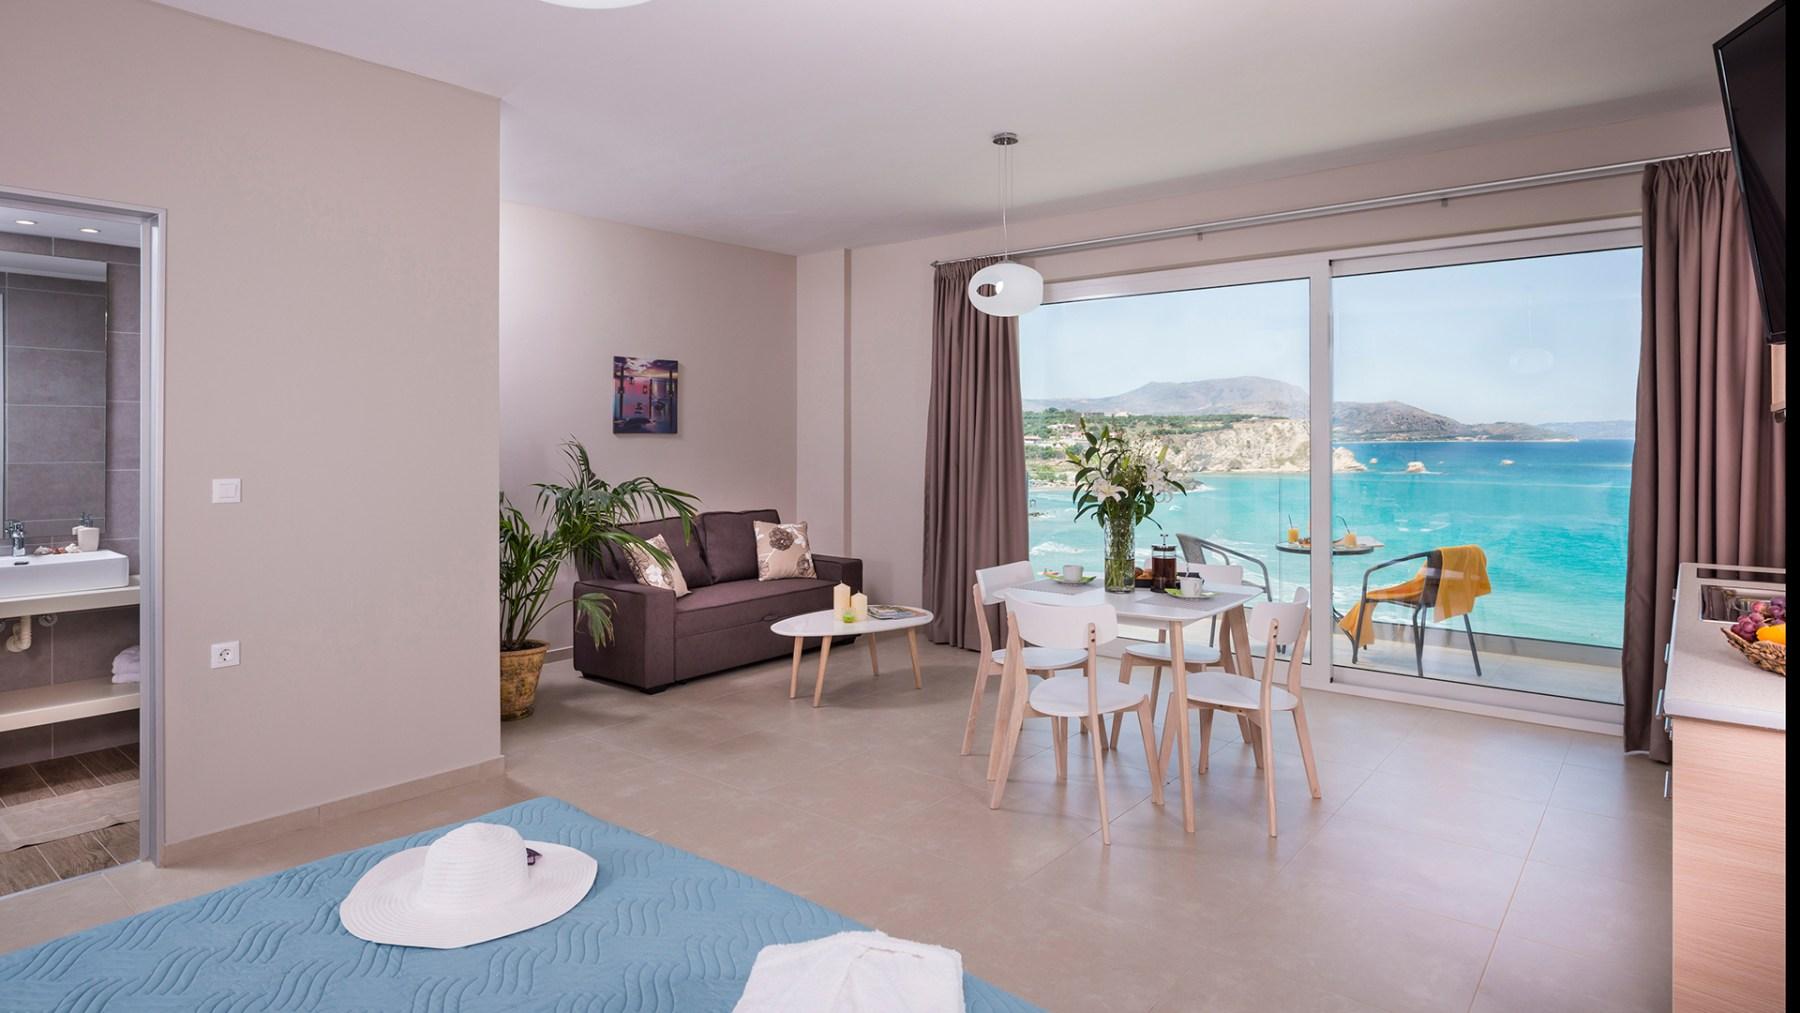 Westkreta Apartments Almyrida Panorama